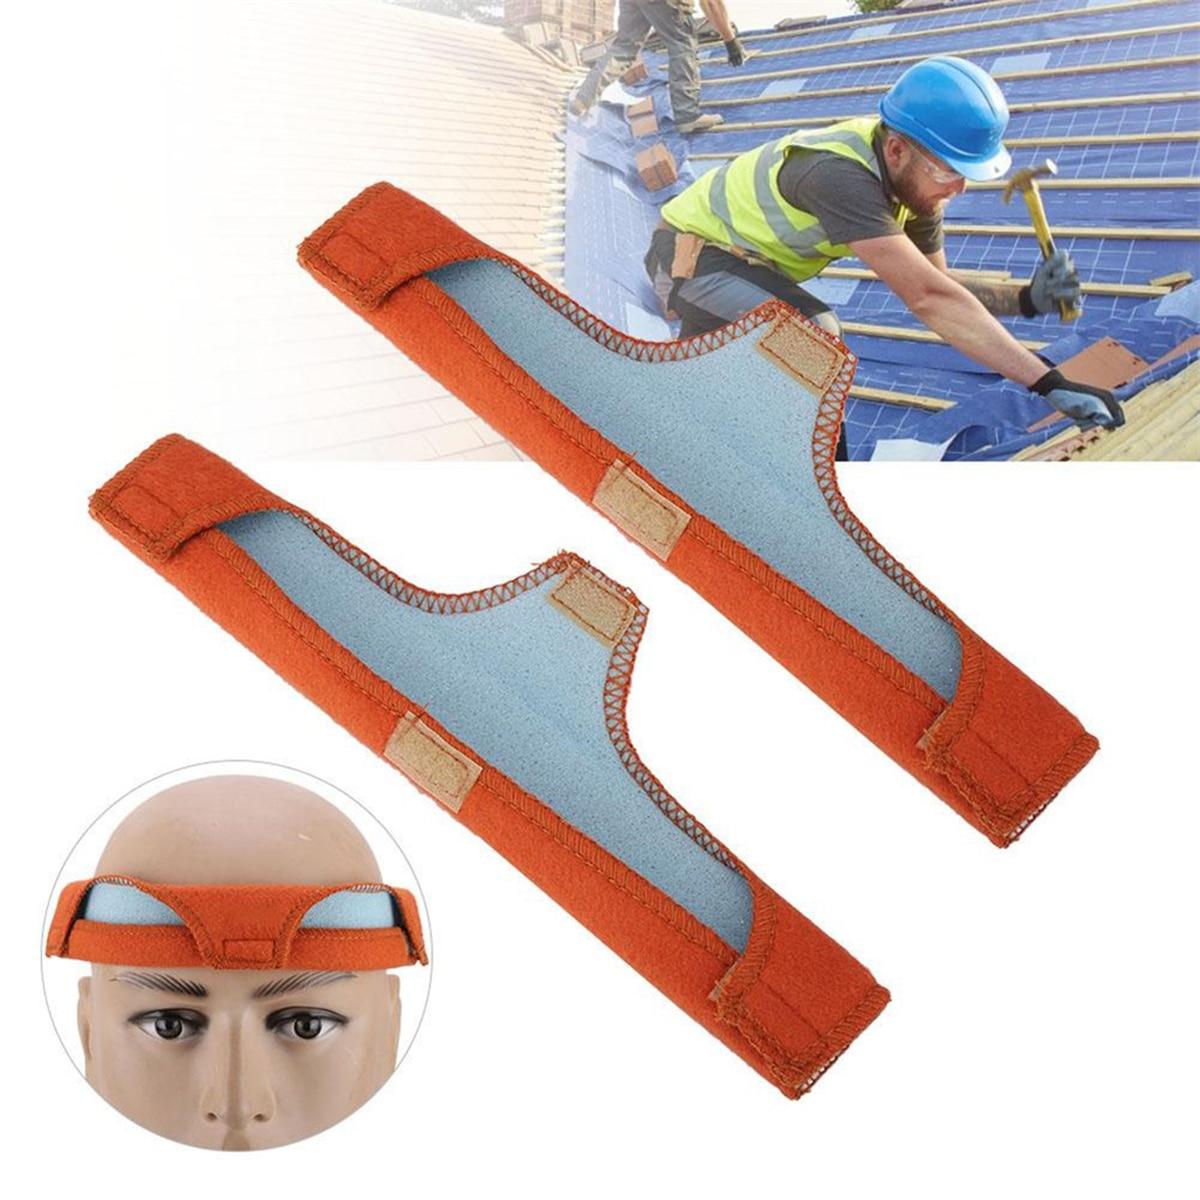 2pcs Helmet Sweatbands With Sponge Foam Super Soft Cotton Water Absorption Sweat Band For Hard Hat Safety Helmet Welding Helmet